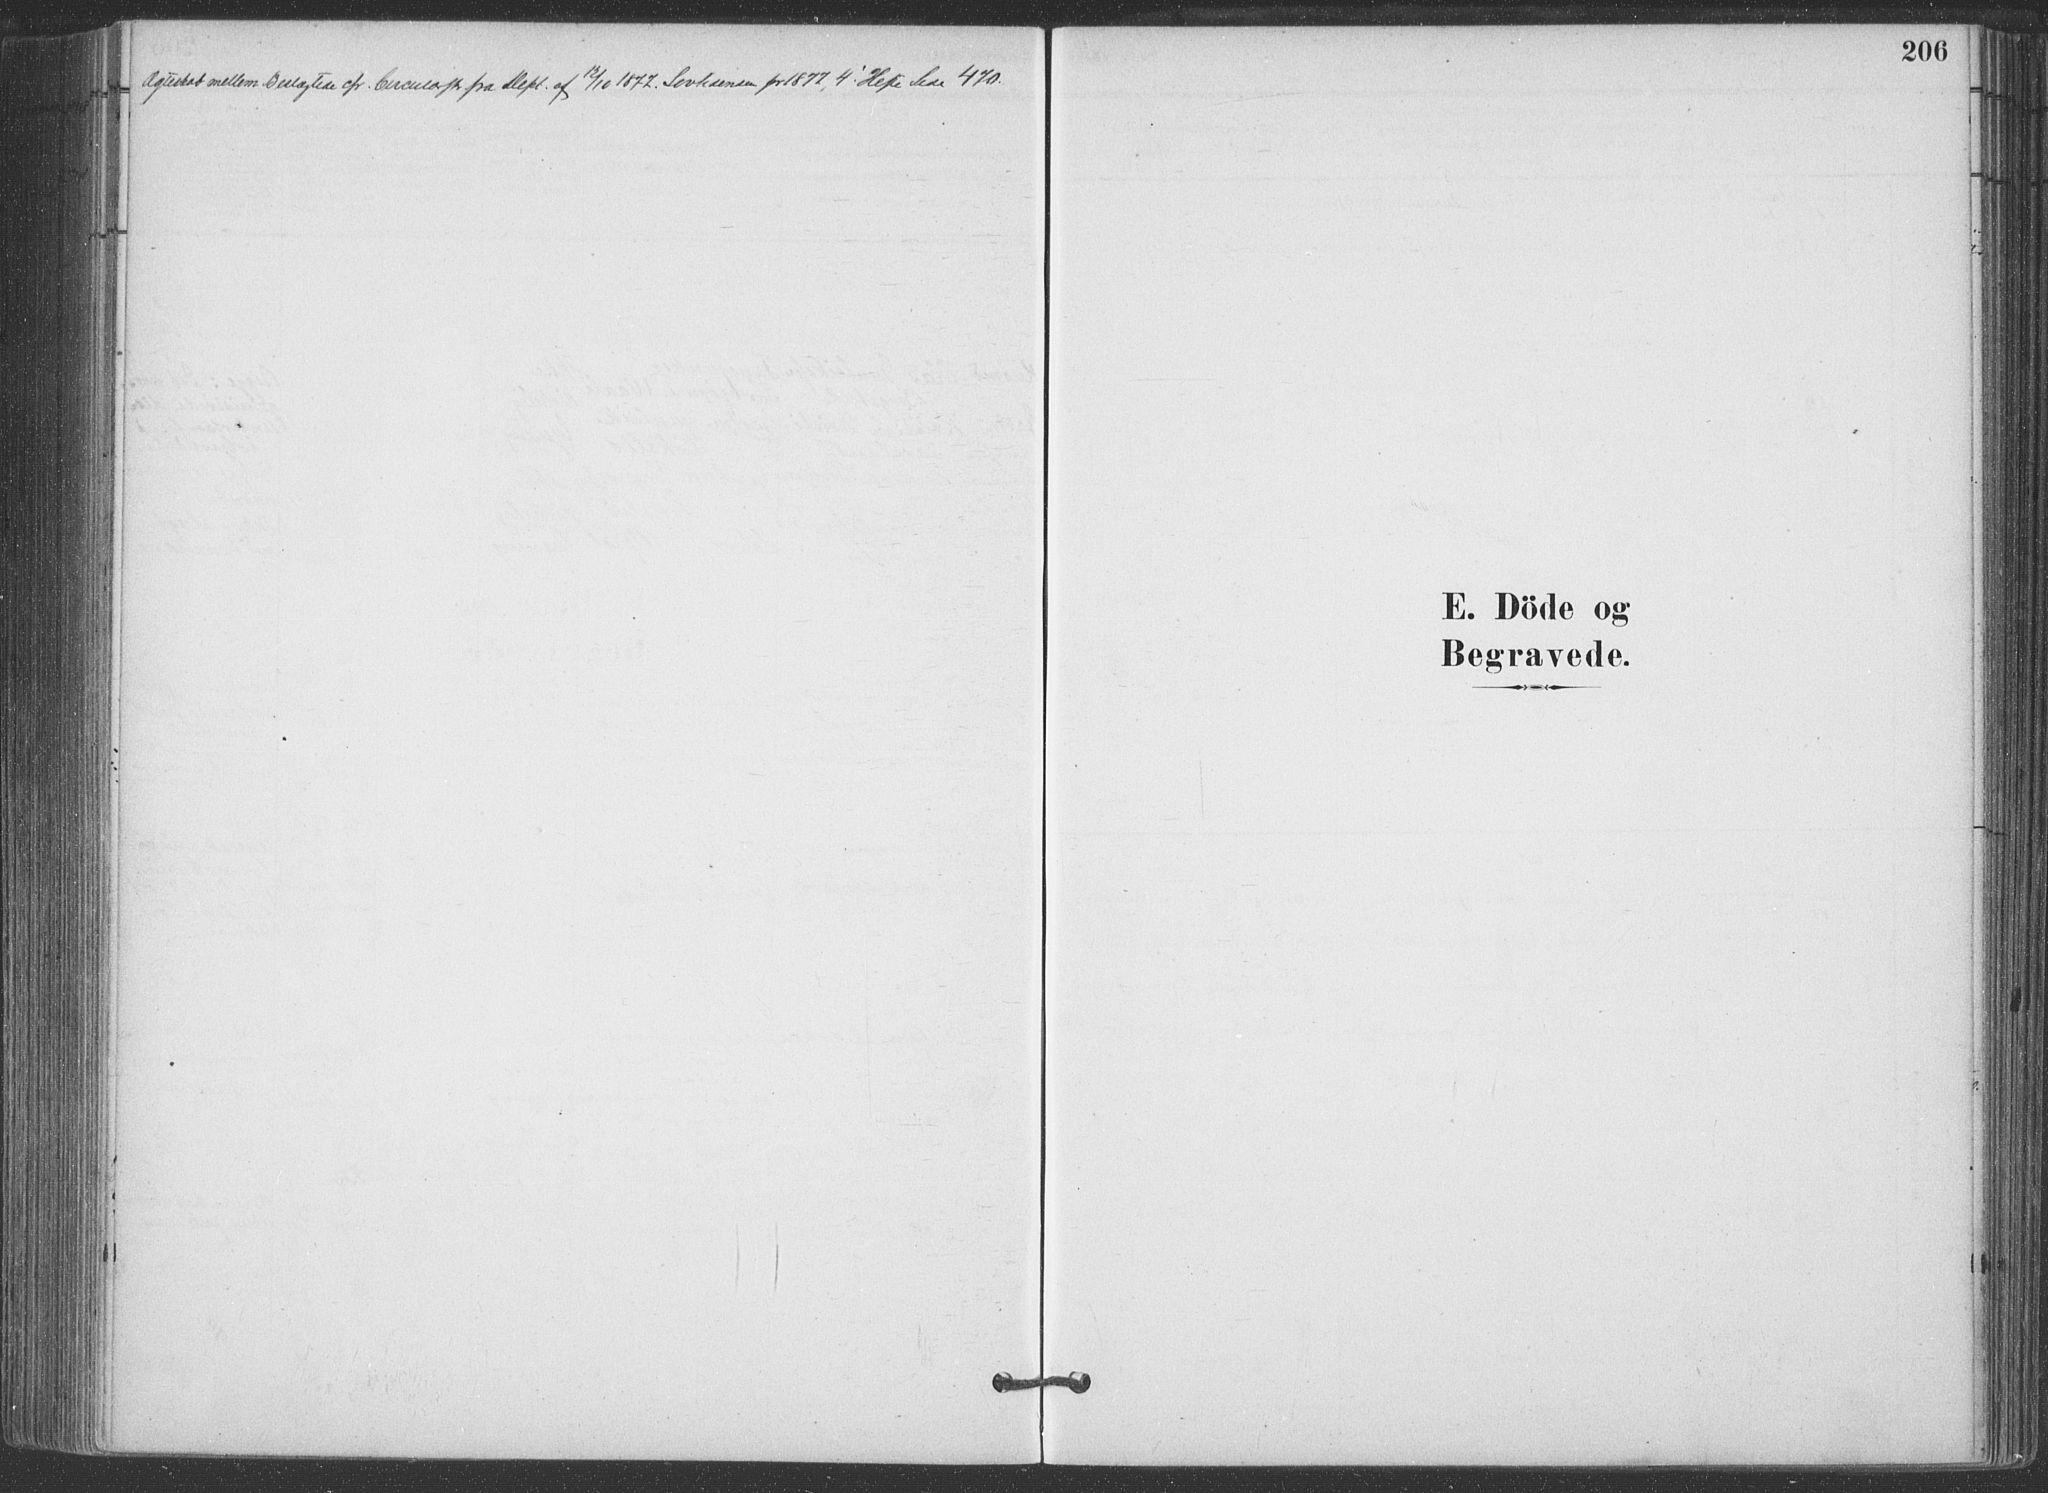 SAKO, Hjartdal kirkebøker, F/Fa/L0010: Ministerialbok nr. I 10, 1880-1929, s. 206